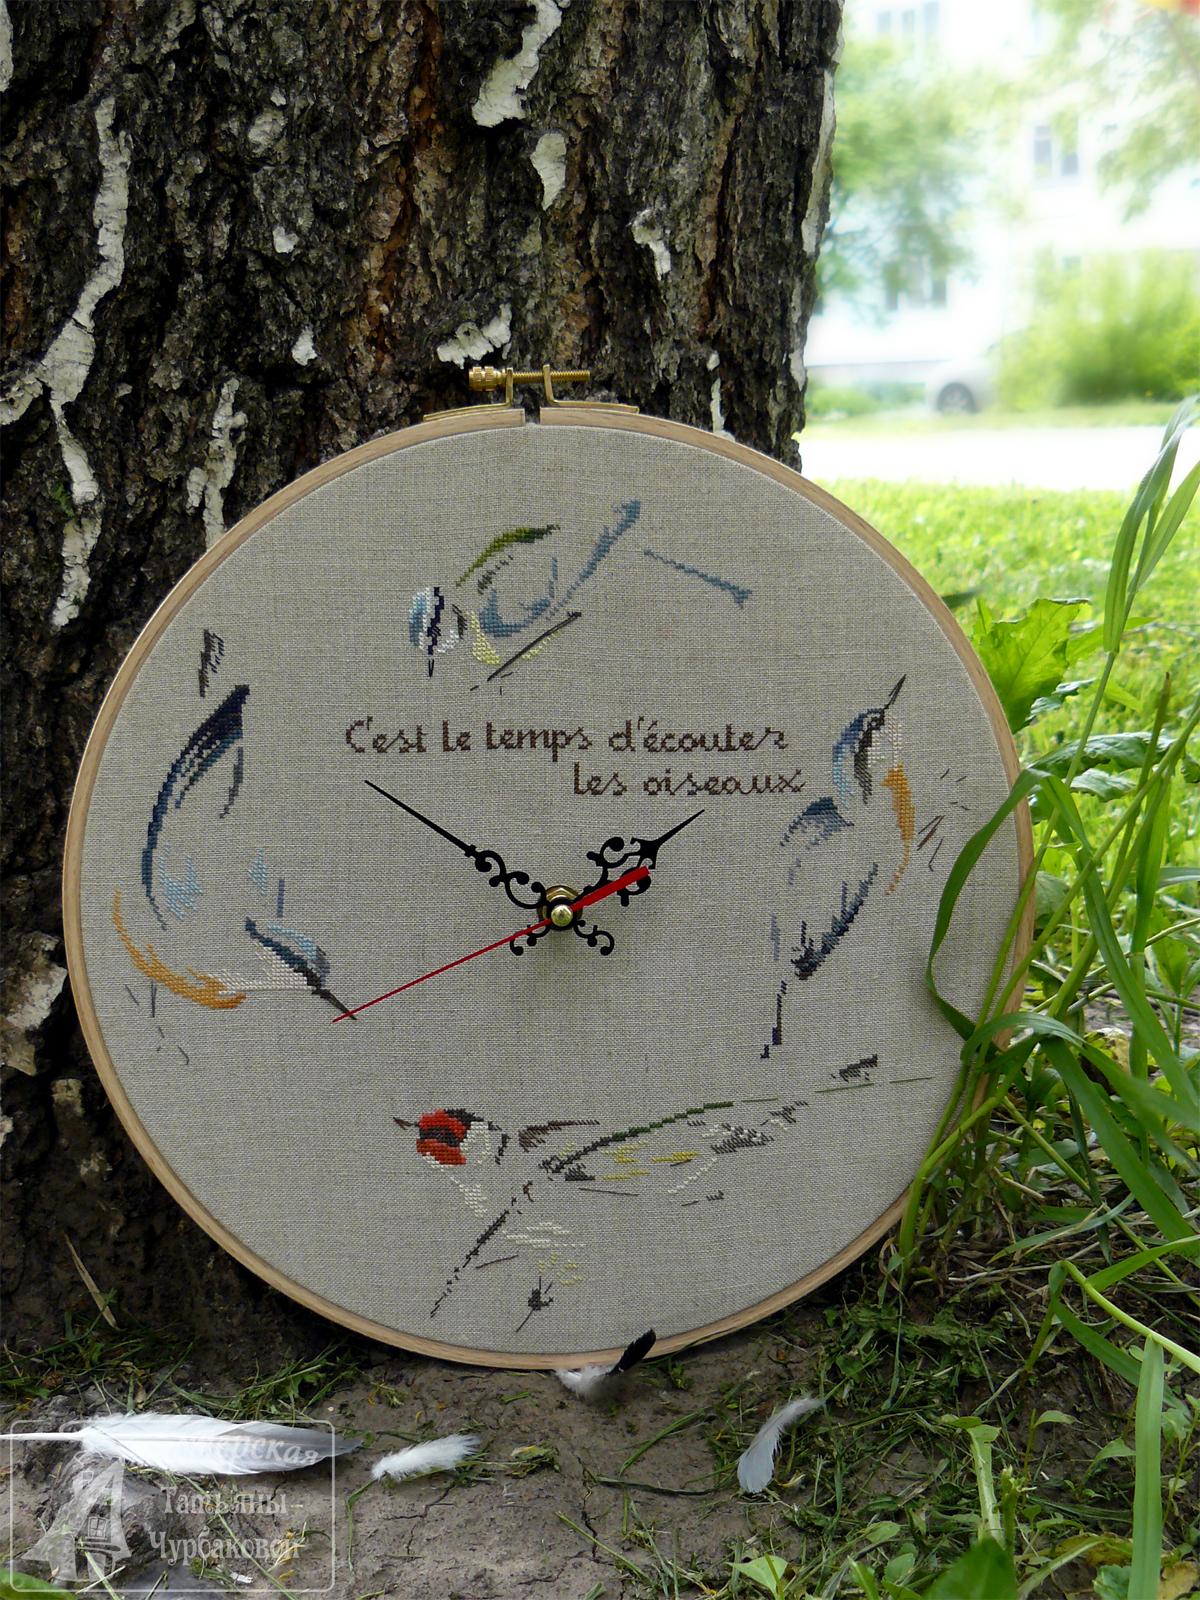 часы время слушать птиц mtsa les oiseaux